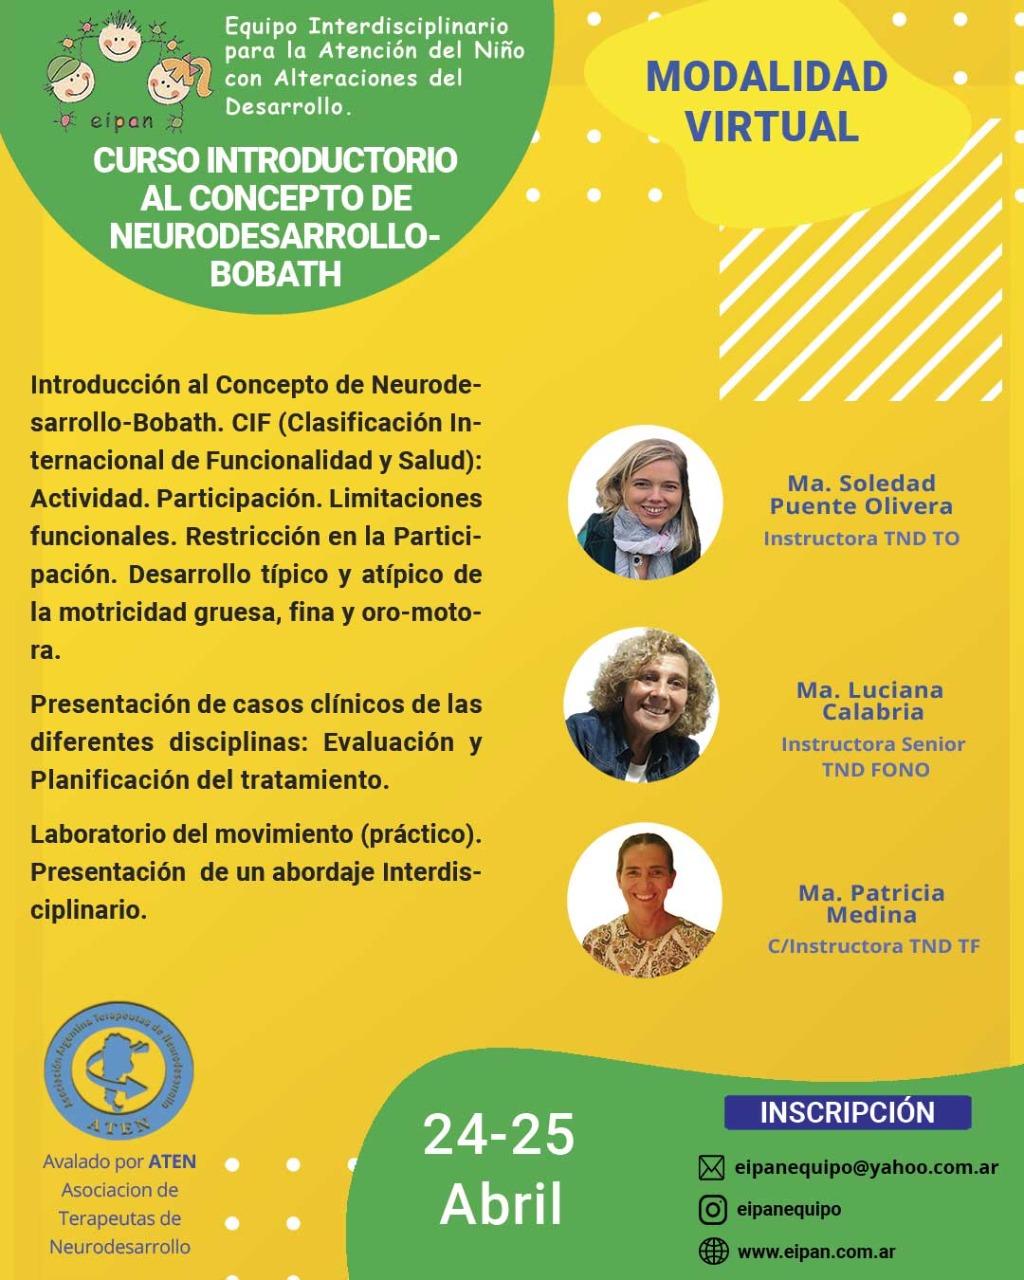 Flyer Introductorio Eipan Virtual